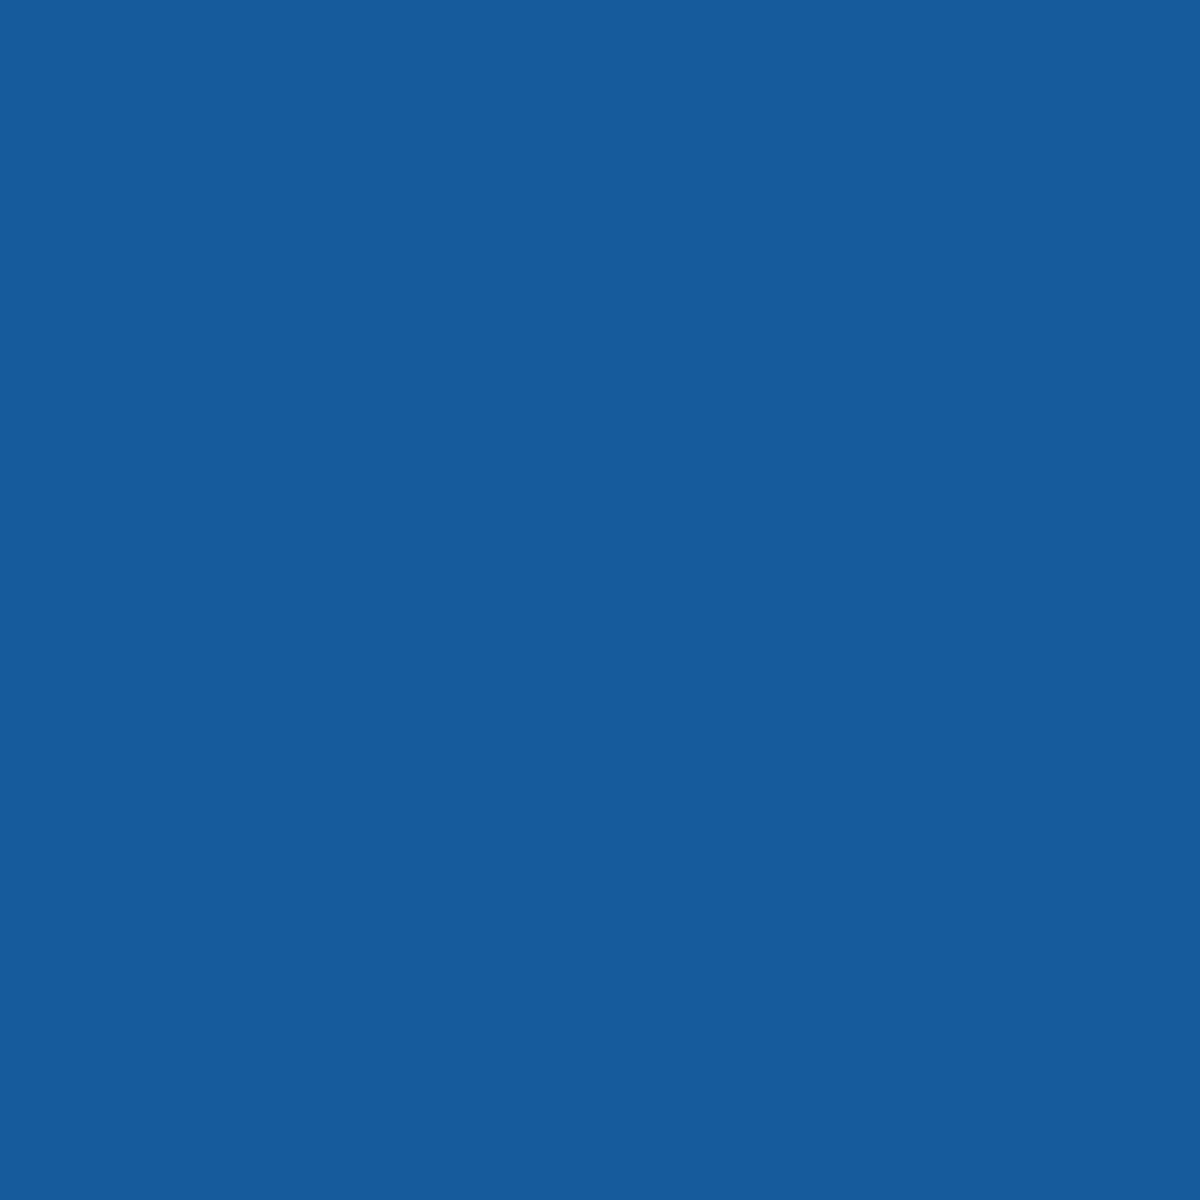 Cobolt Blu - Brigt Blue